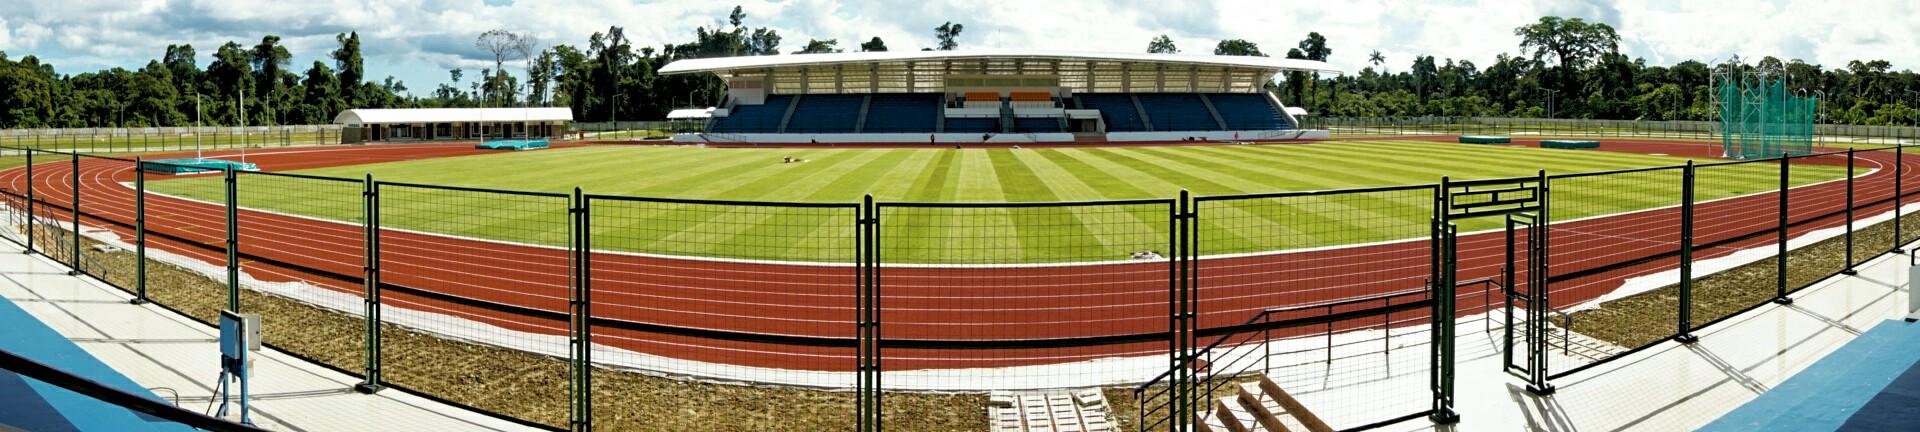 Kemegahan Stadion Atletik kebanggan Timika (Foto: Bagus DR / GNFI)